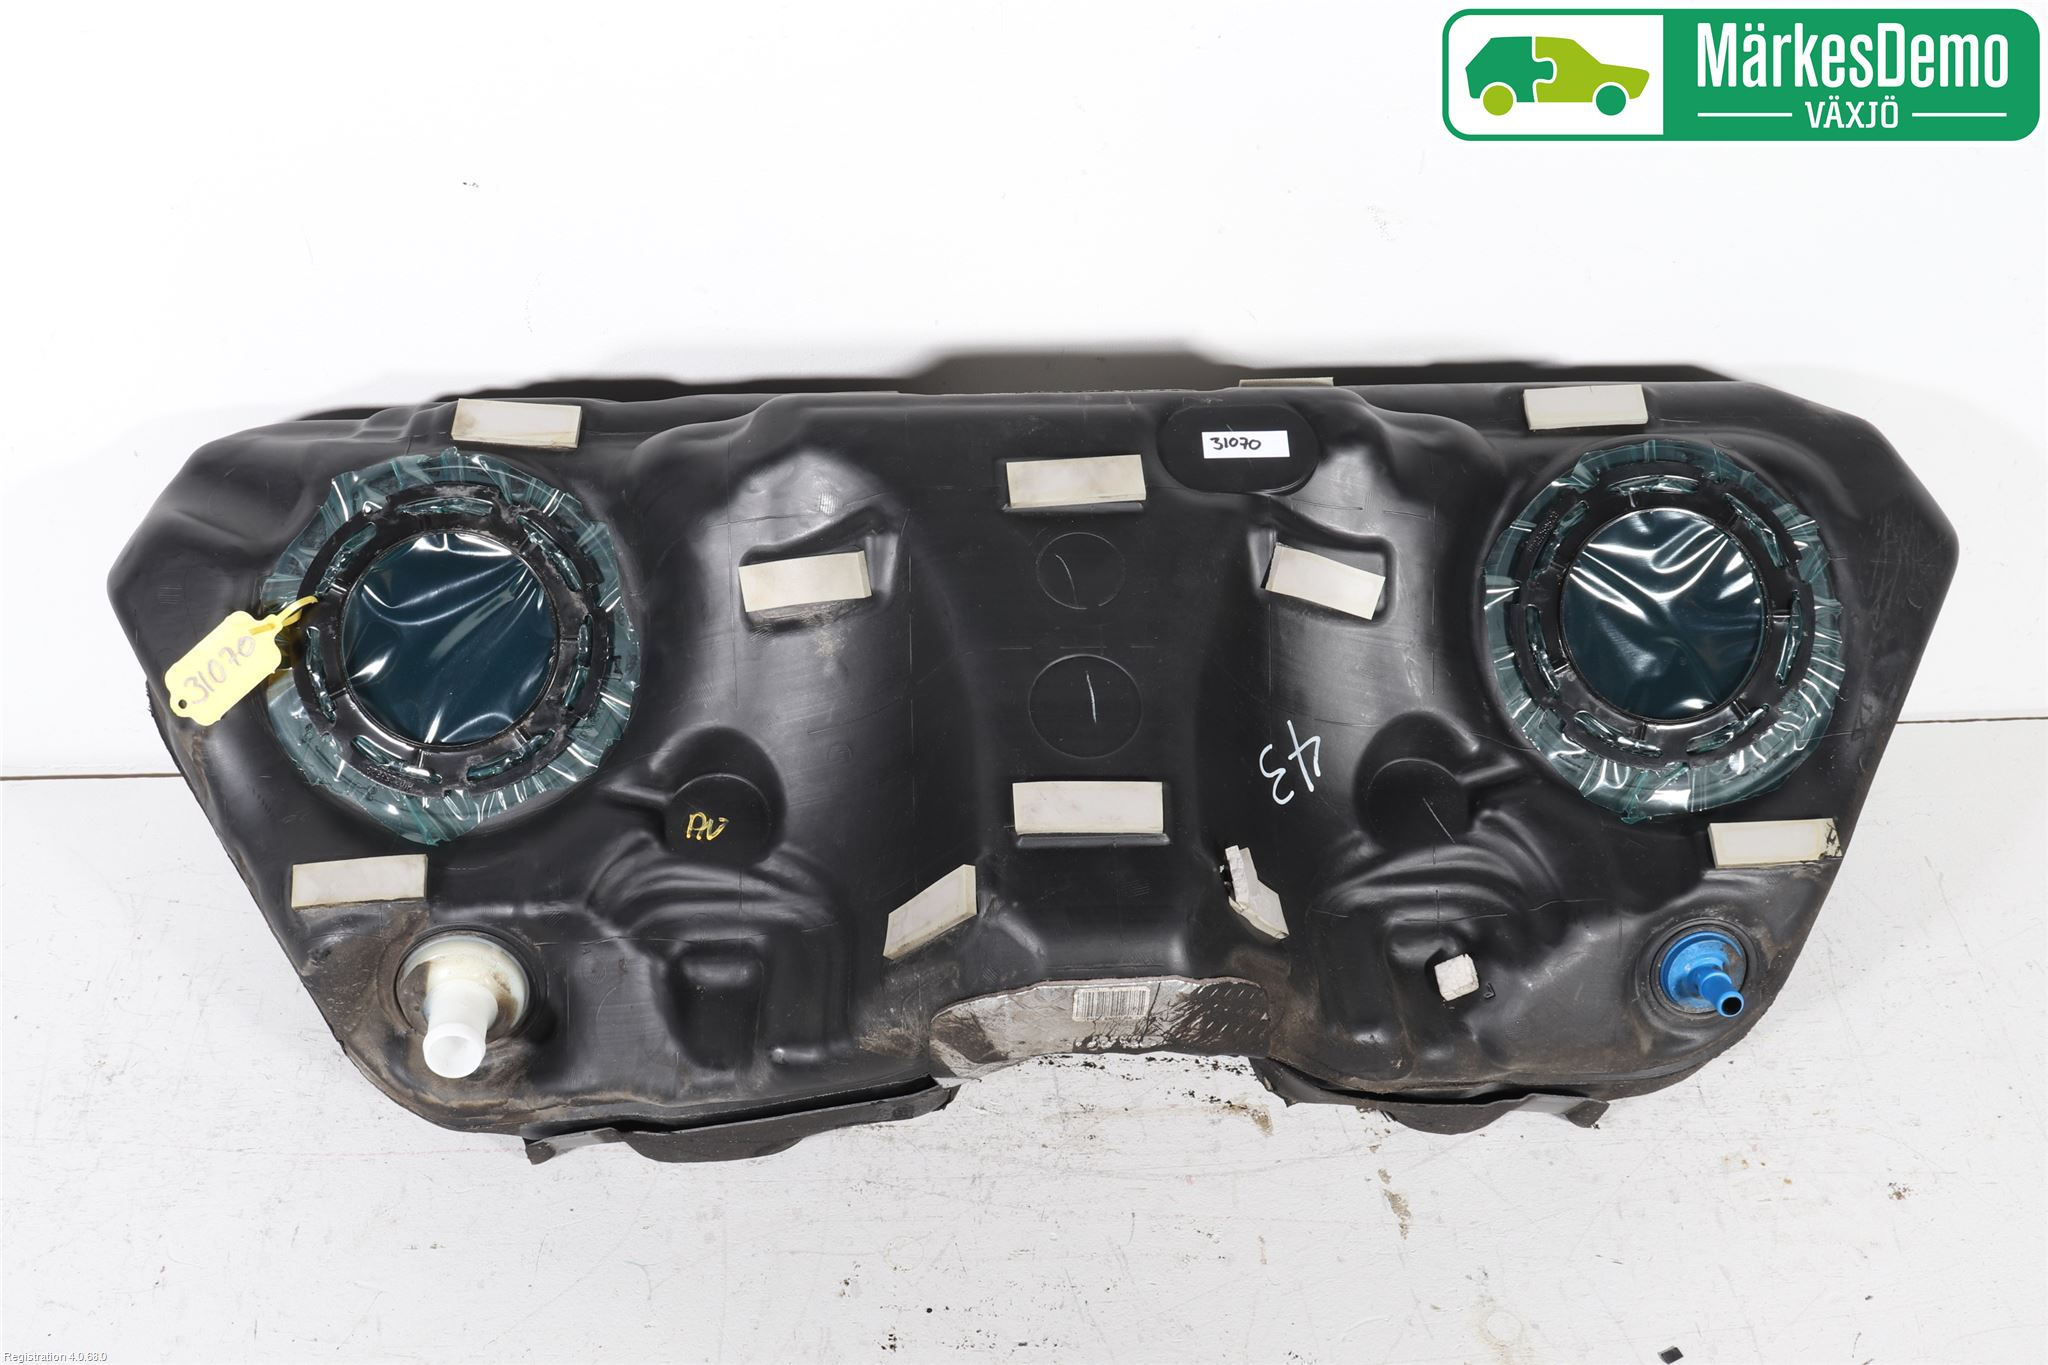 Bränsletank insprutning - 2,3 BENSIN, PLAST image